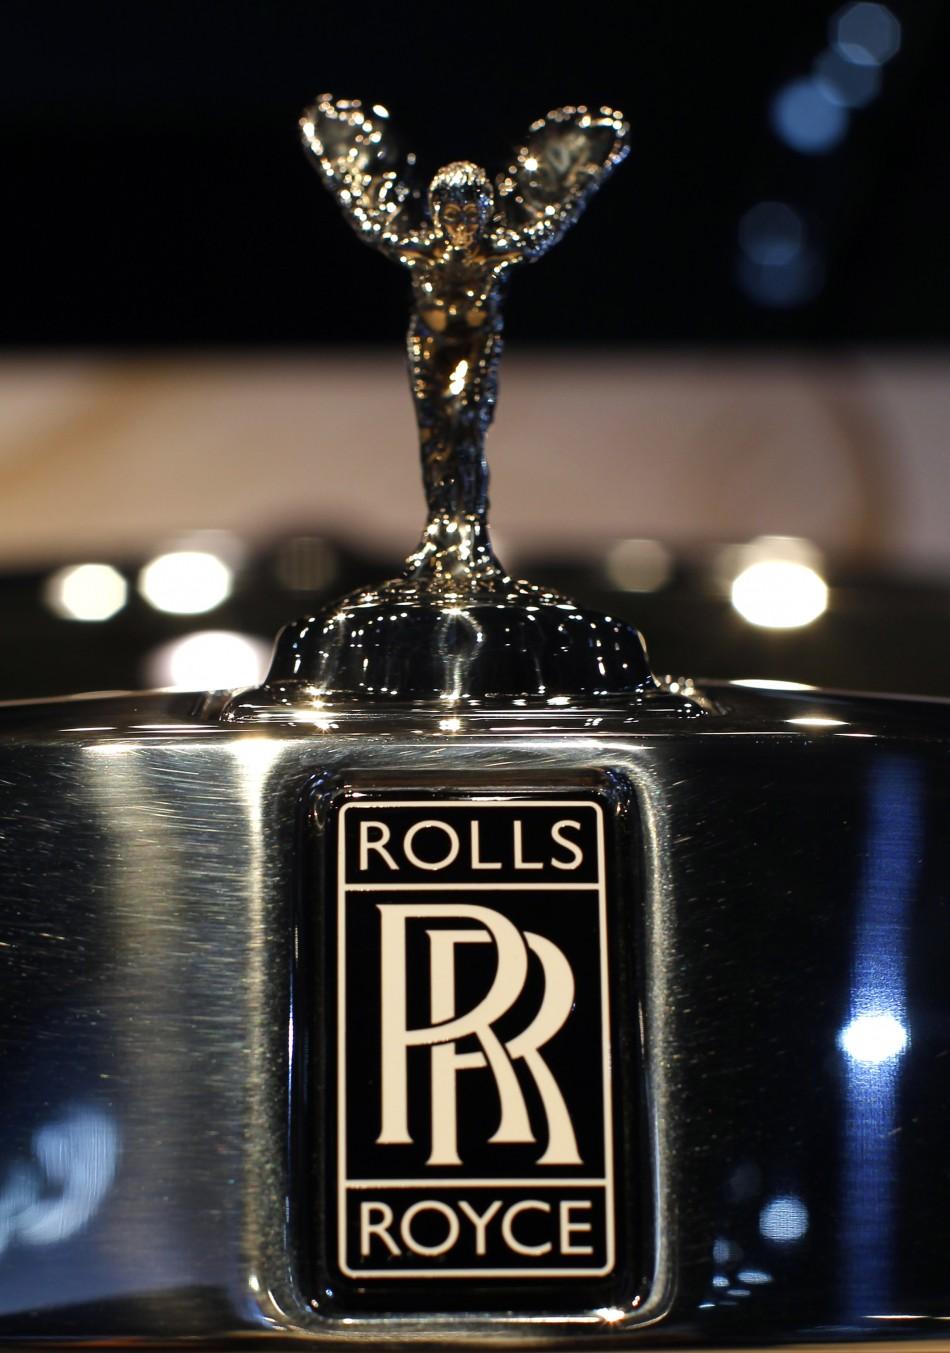 New Autos,Latest Cars,Cars in 2012: Rolls Royce Logo